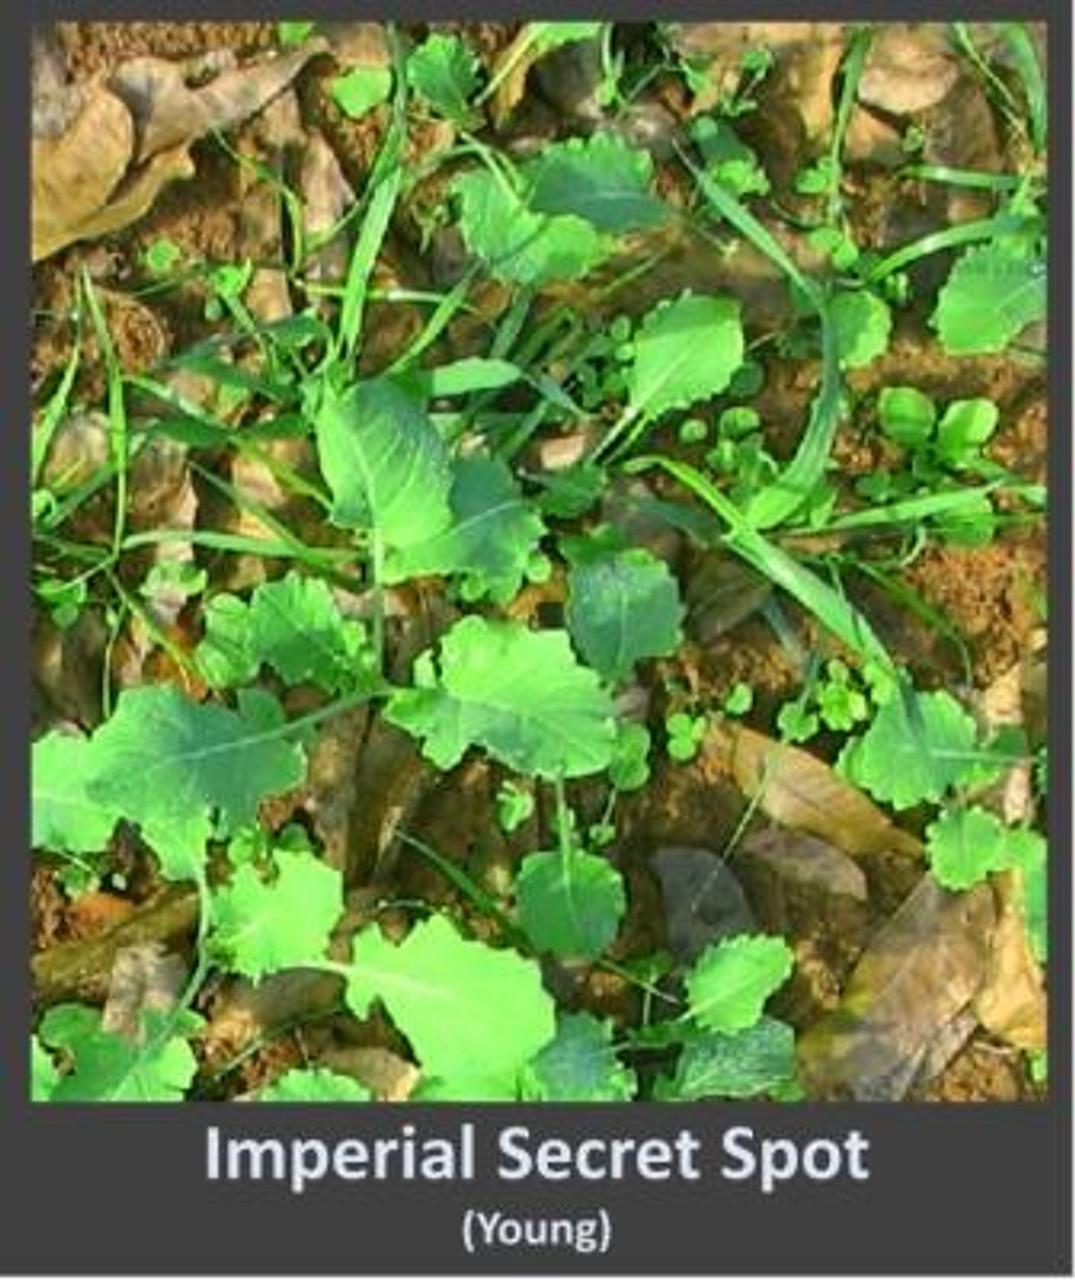 Young Secret Spot